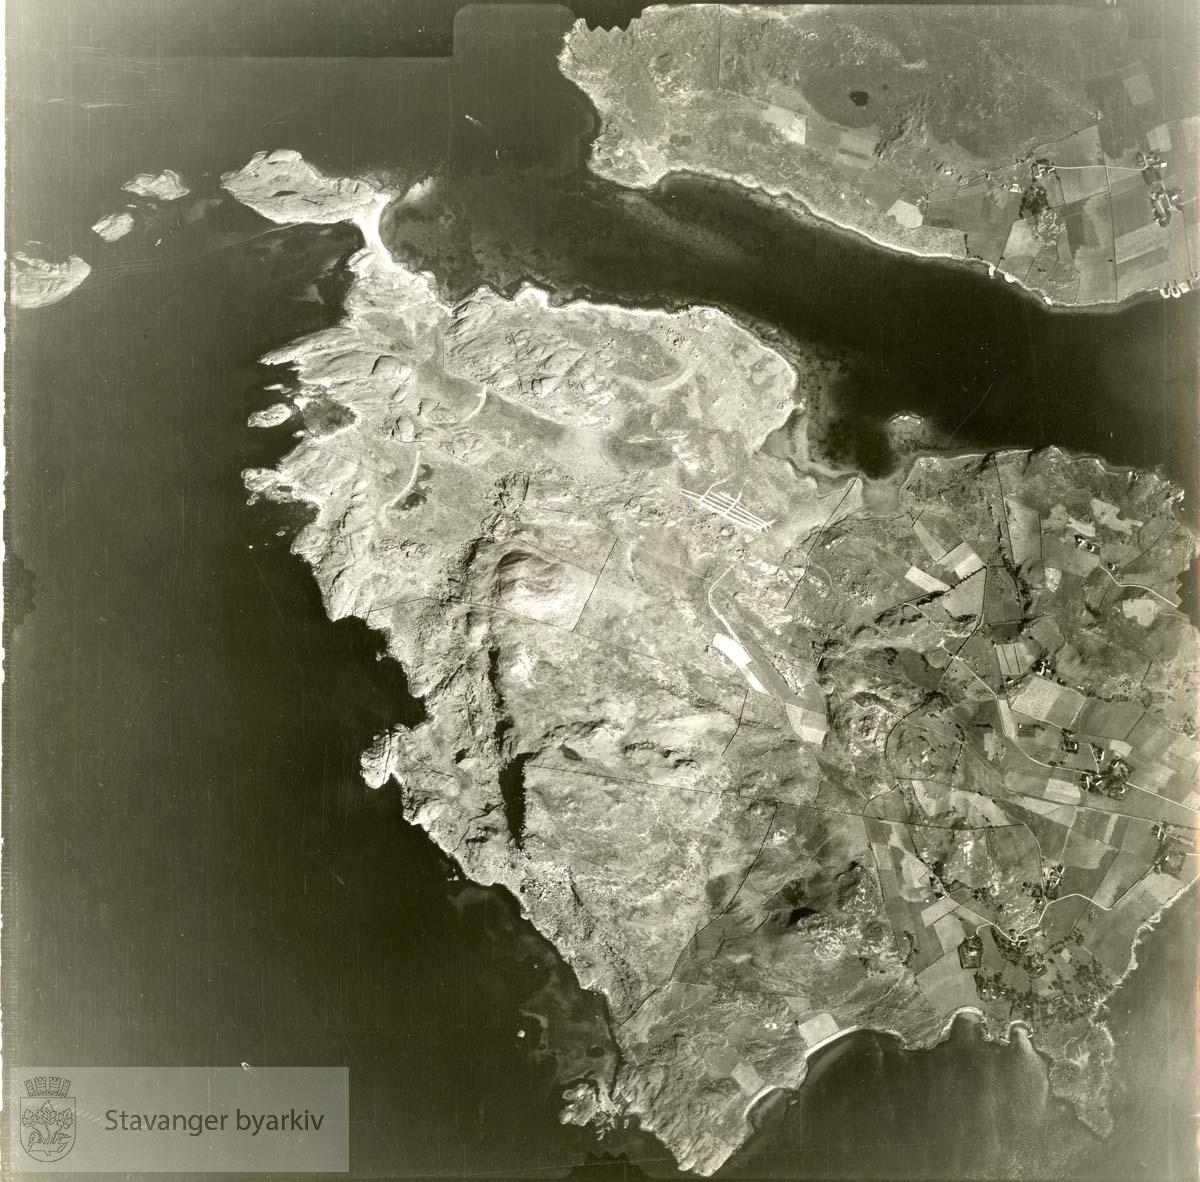 Jfr. kart/fotoplan C45/433..Bru og Sokn..Se ByStW_Uca_002 (kan lastes ned under fanen for kart på Stavangerbilder)